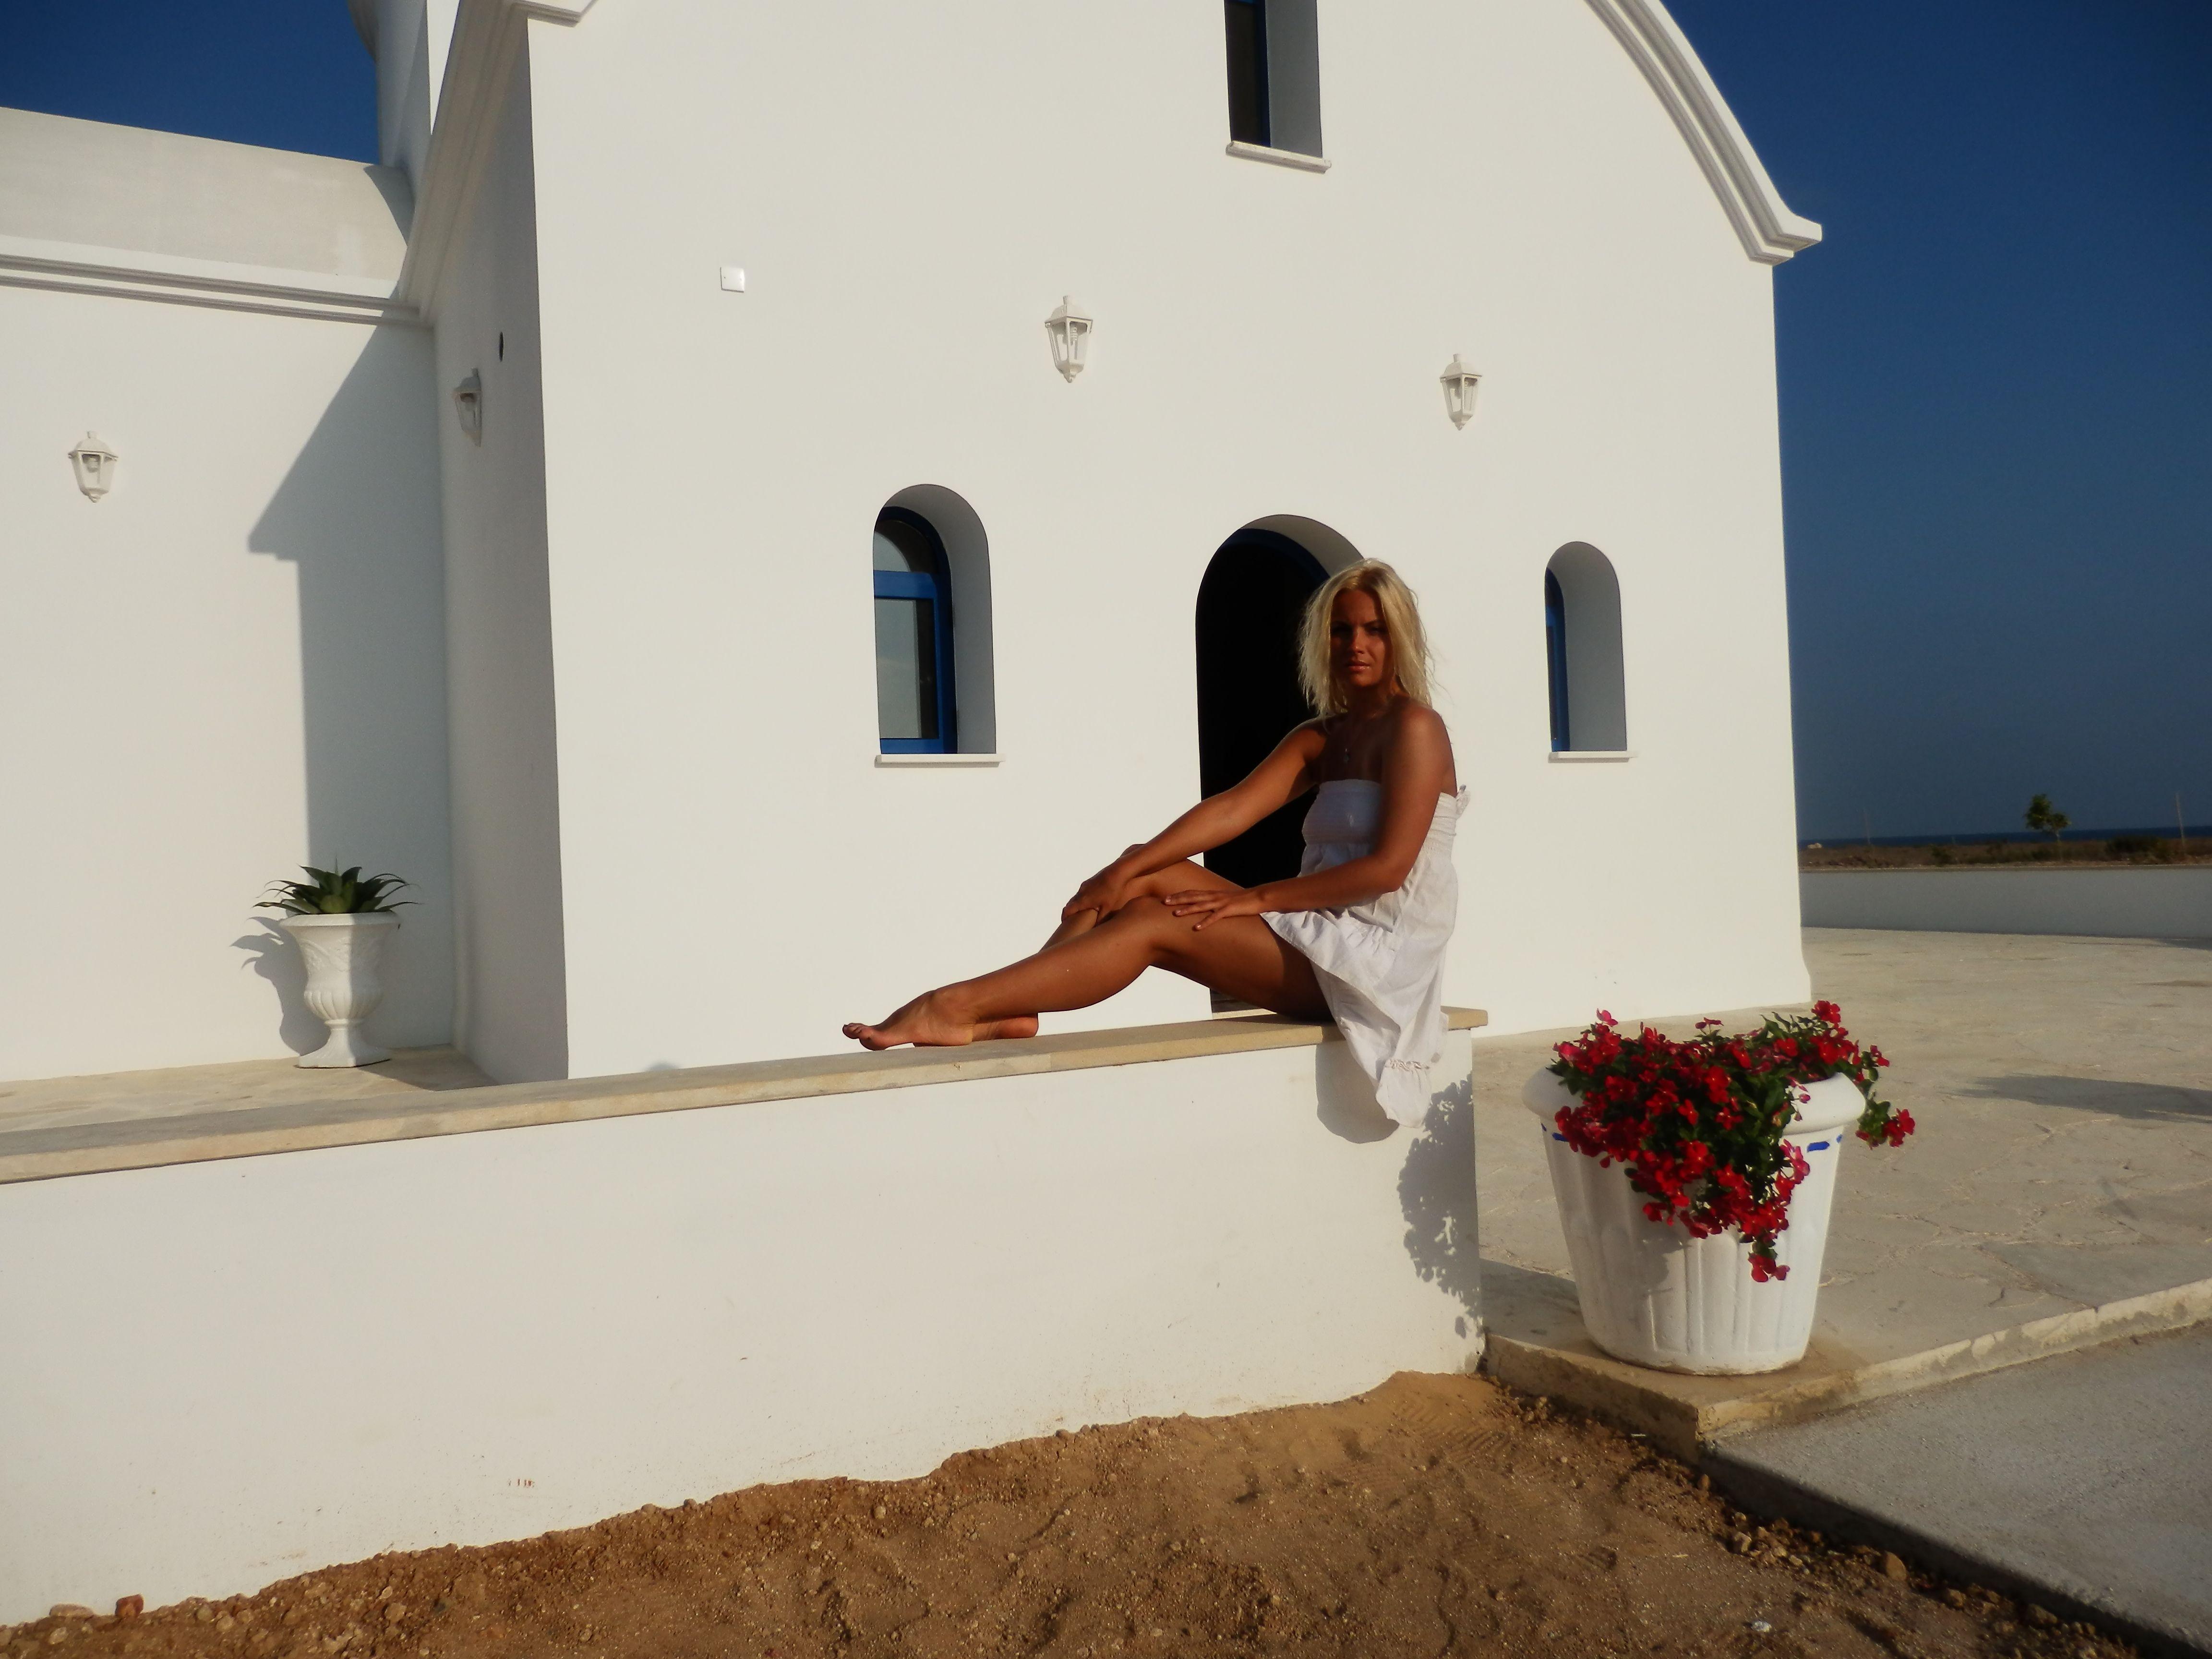 Певица Маша Гойя на Кипре скупала сувениры и косметику